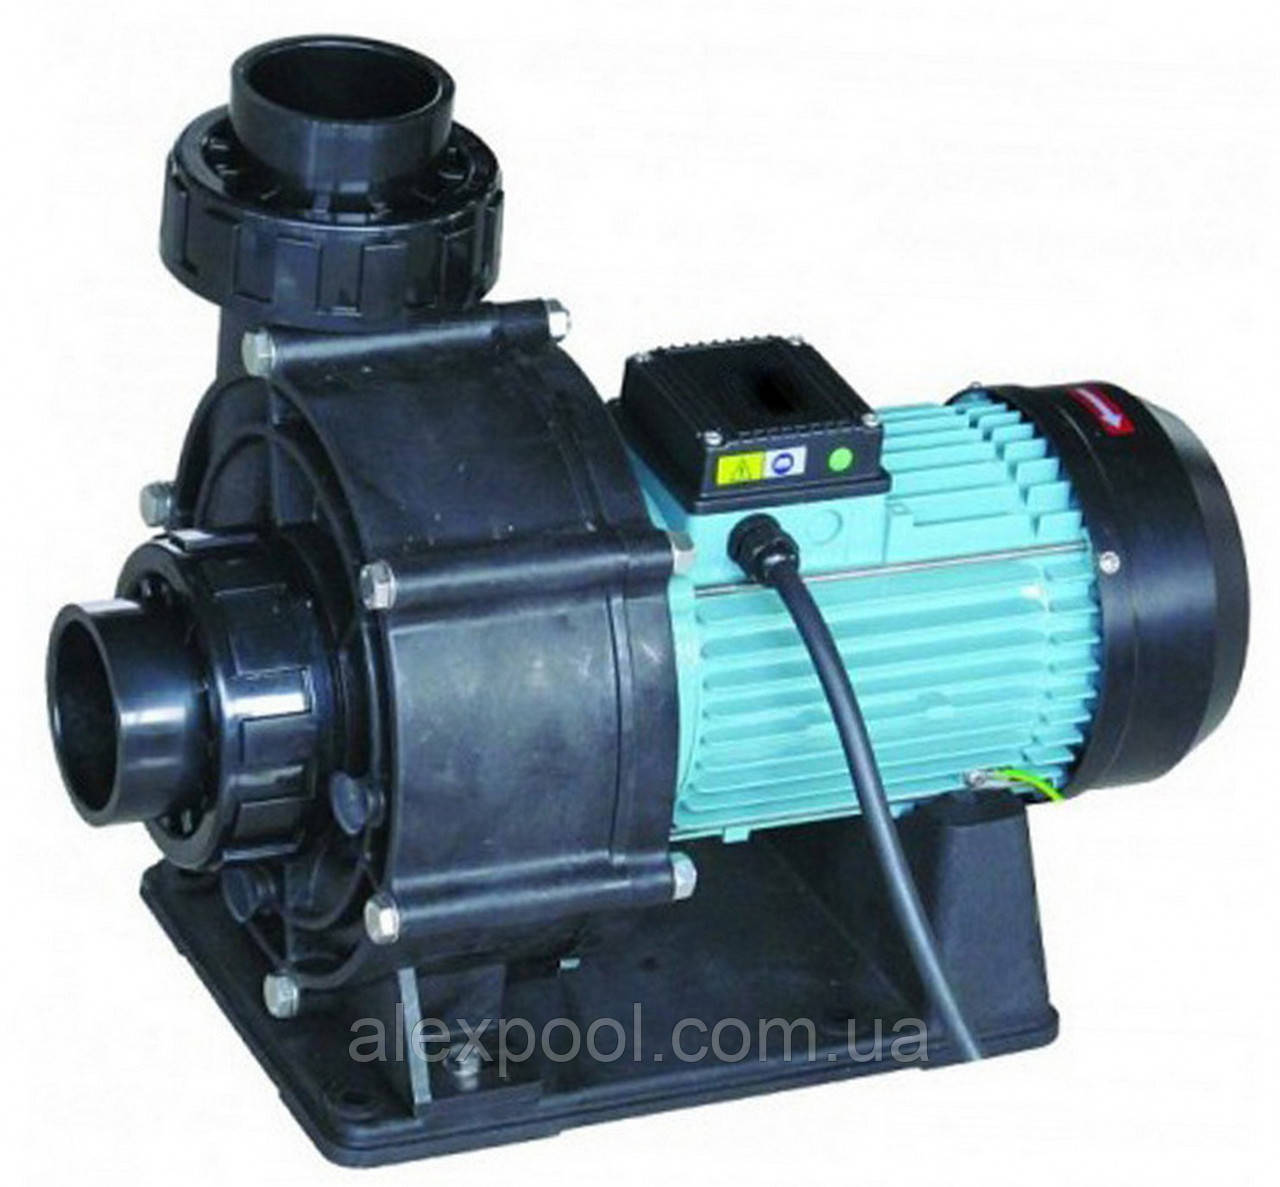 Emaux AFS55 Насос для протитечії (AFS 55, 90 м. куб/год., 4 кВт, 5,5 HP, 380В)